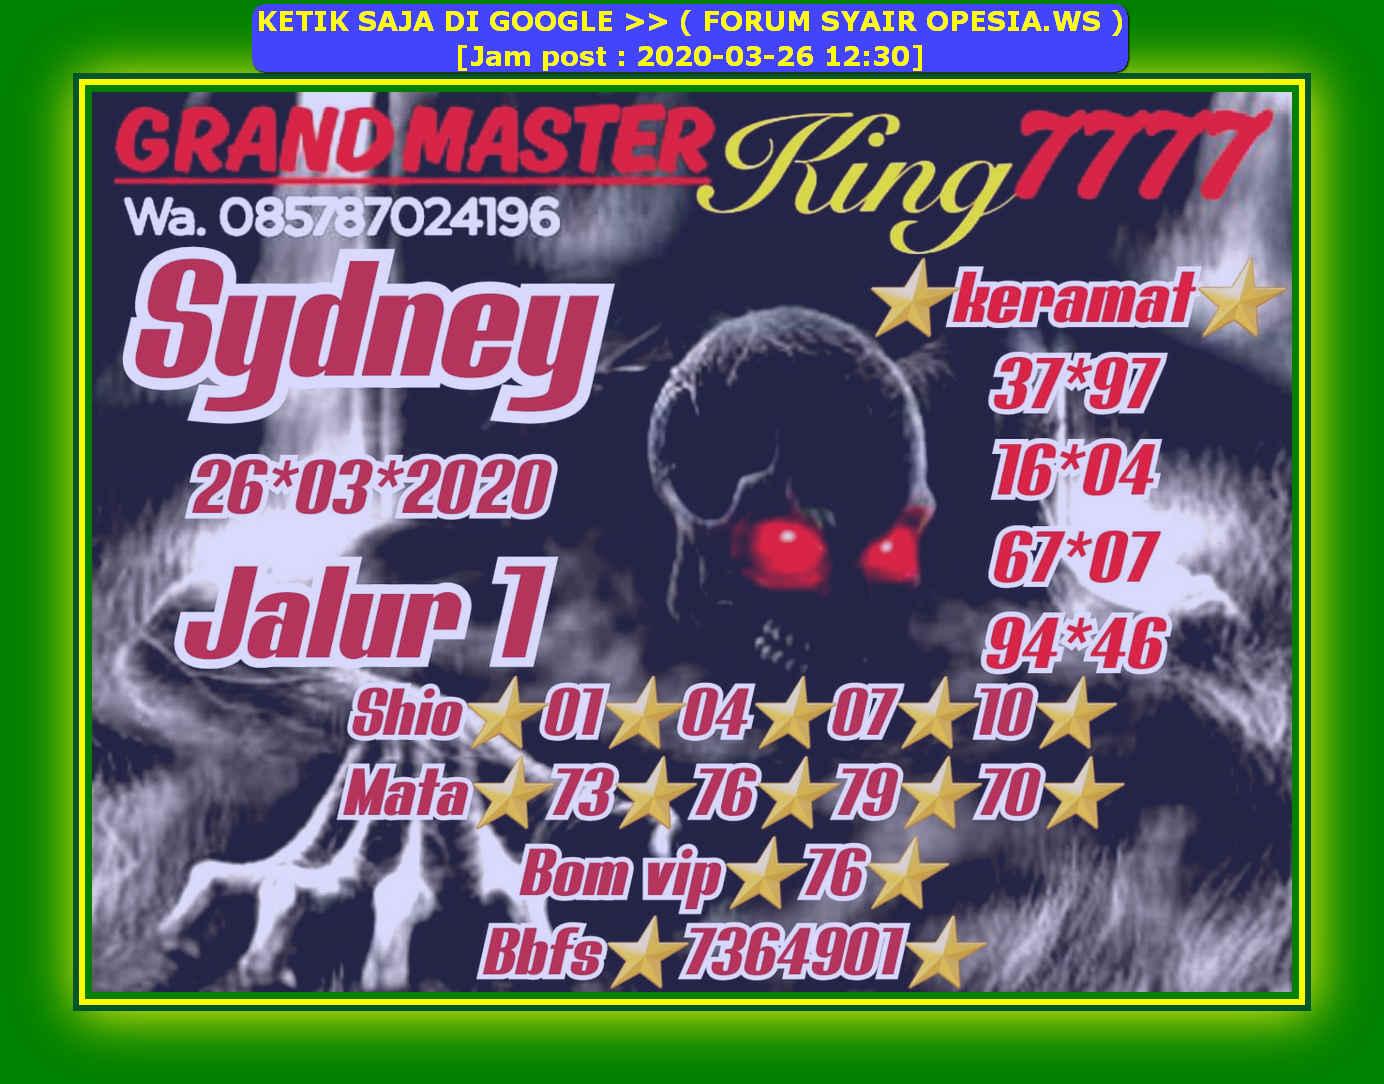 Kode syair Sydney Kamis 26 Maret 2020 2